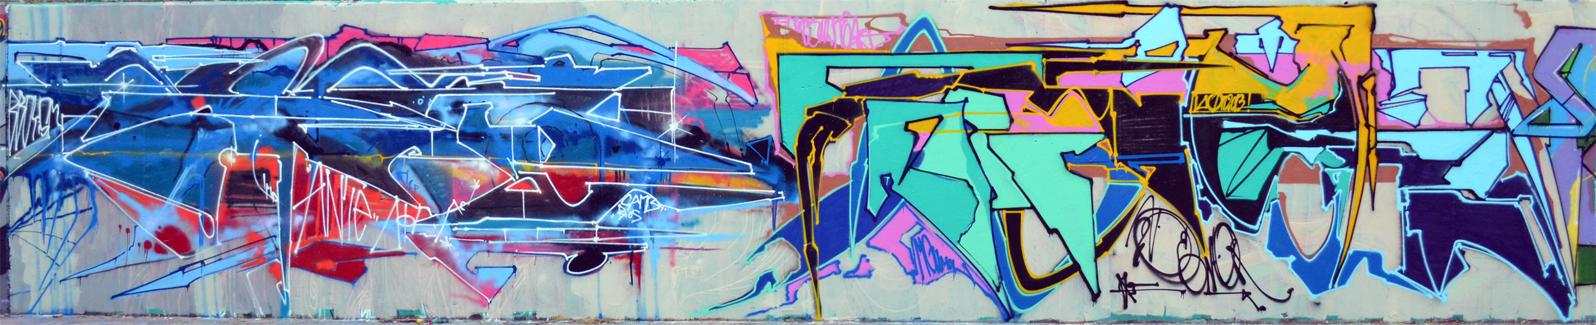 AnteSenor22-11-2013